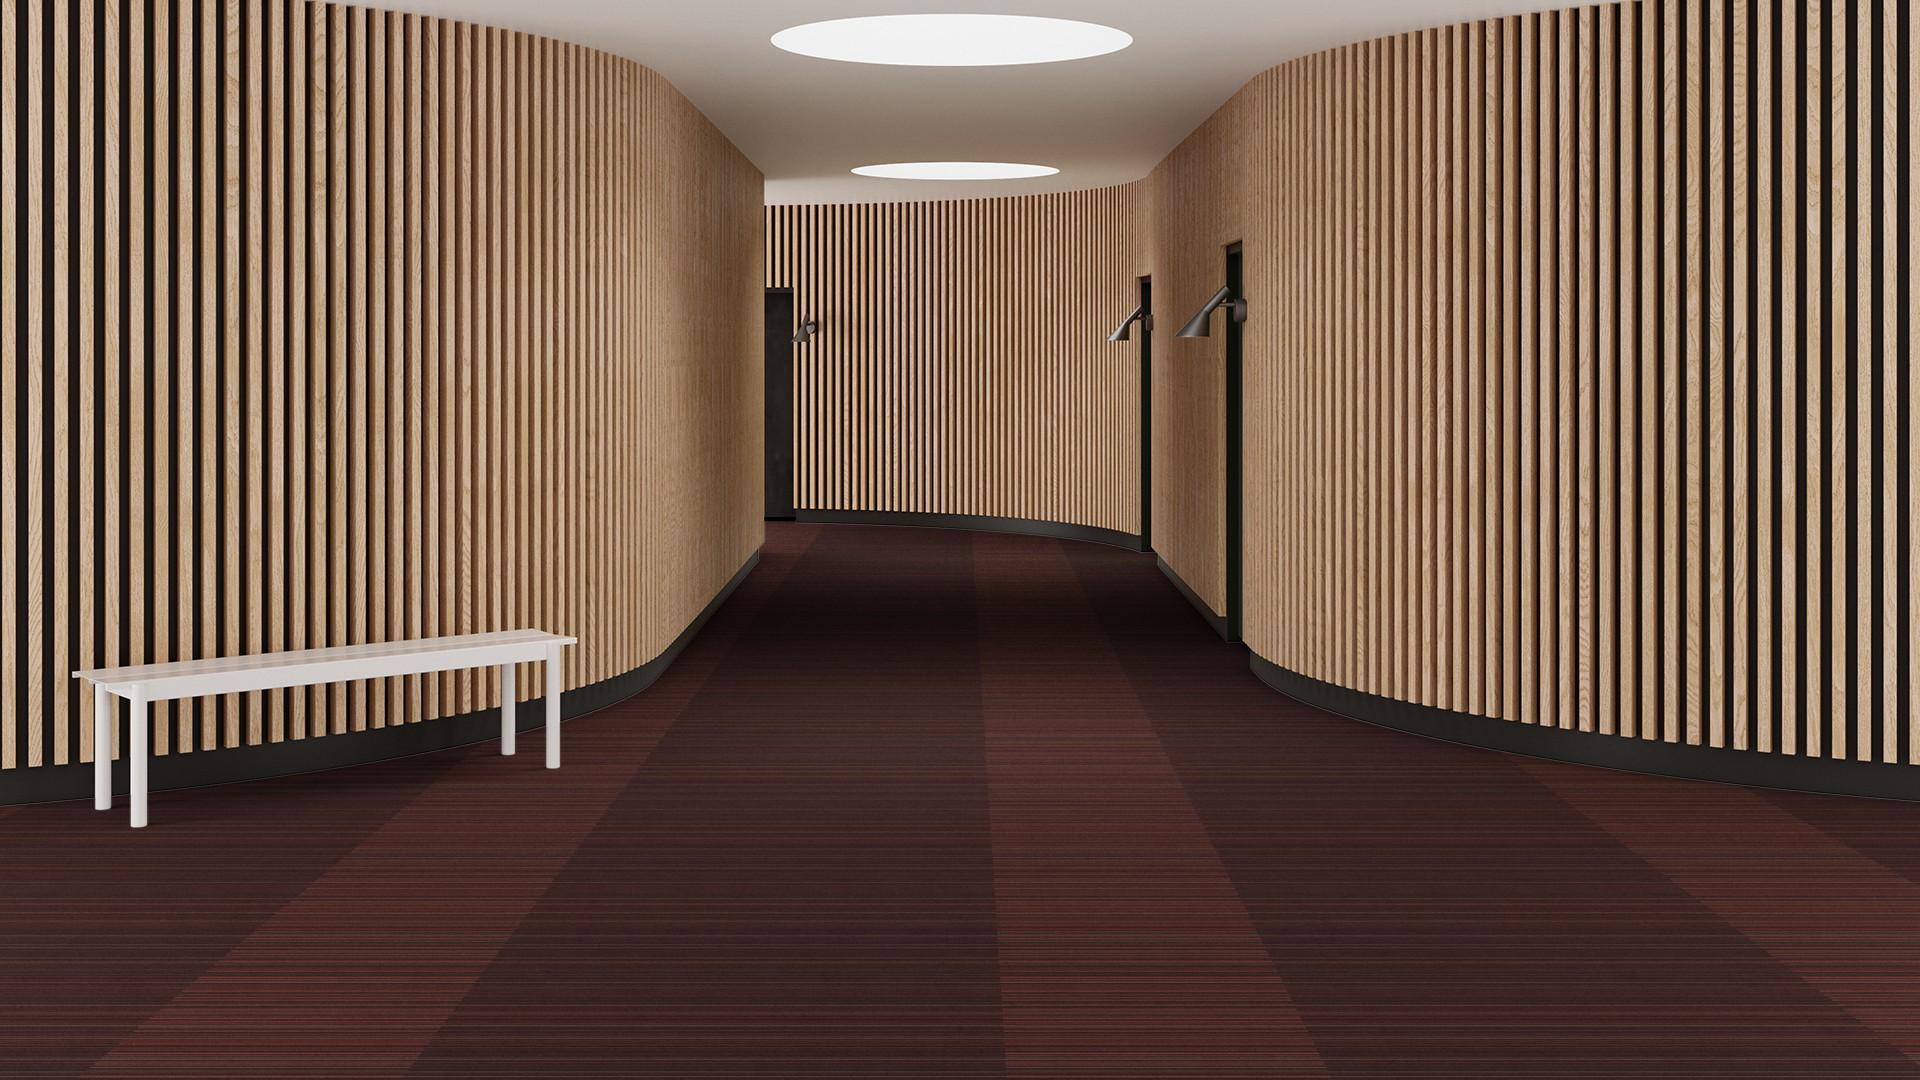 madras stripe corridor 195 cm red RoowView 3